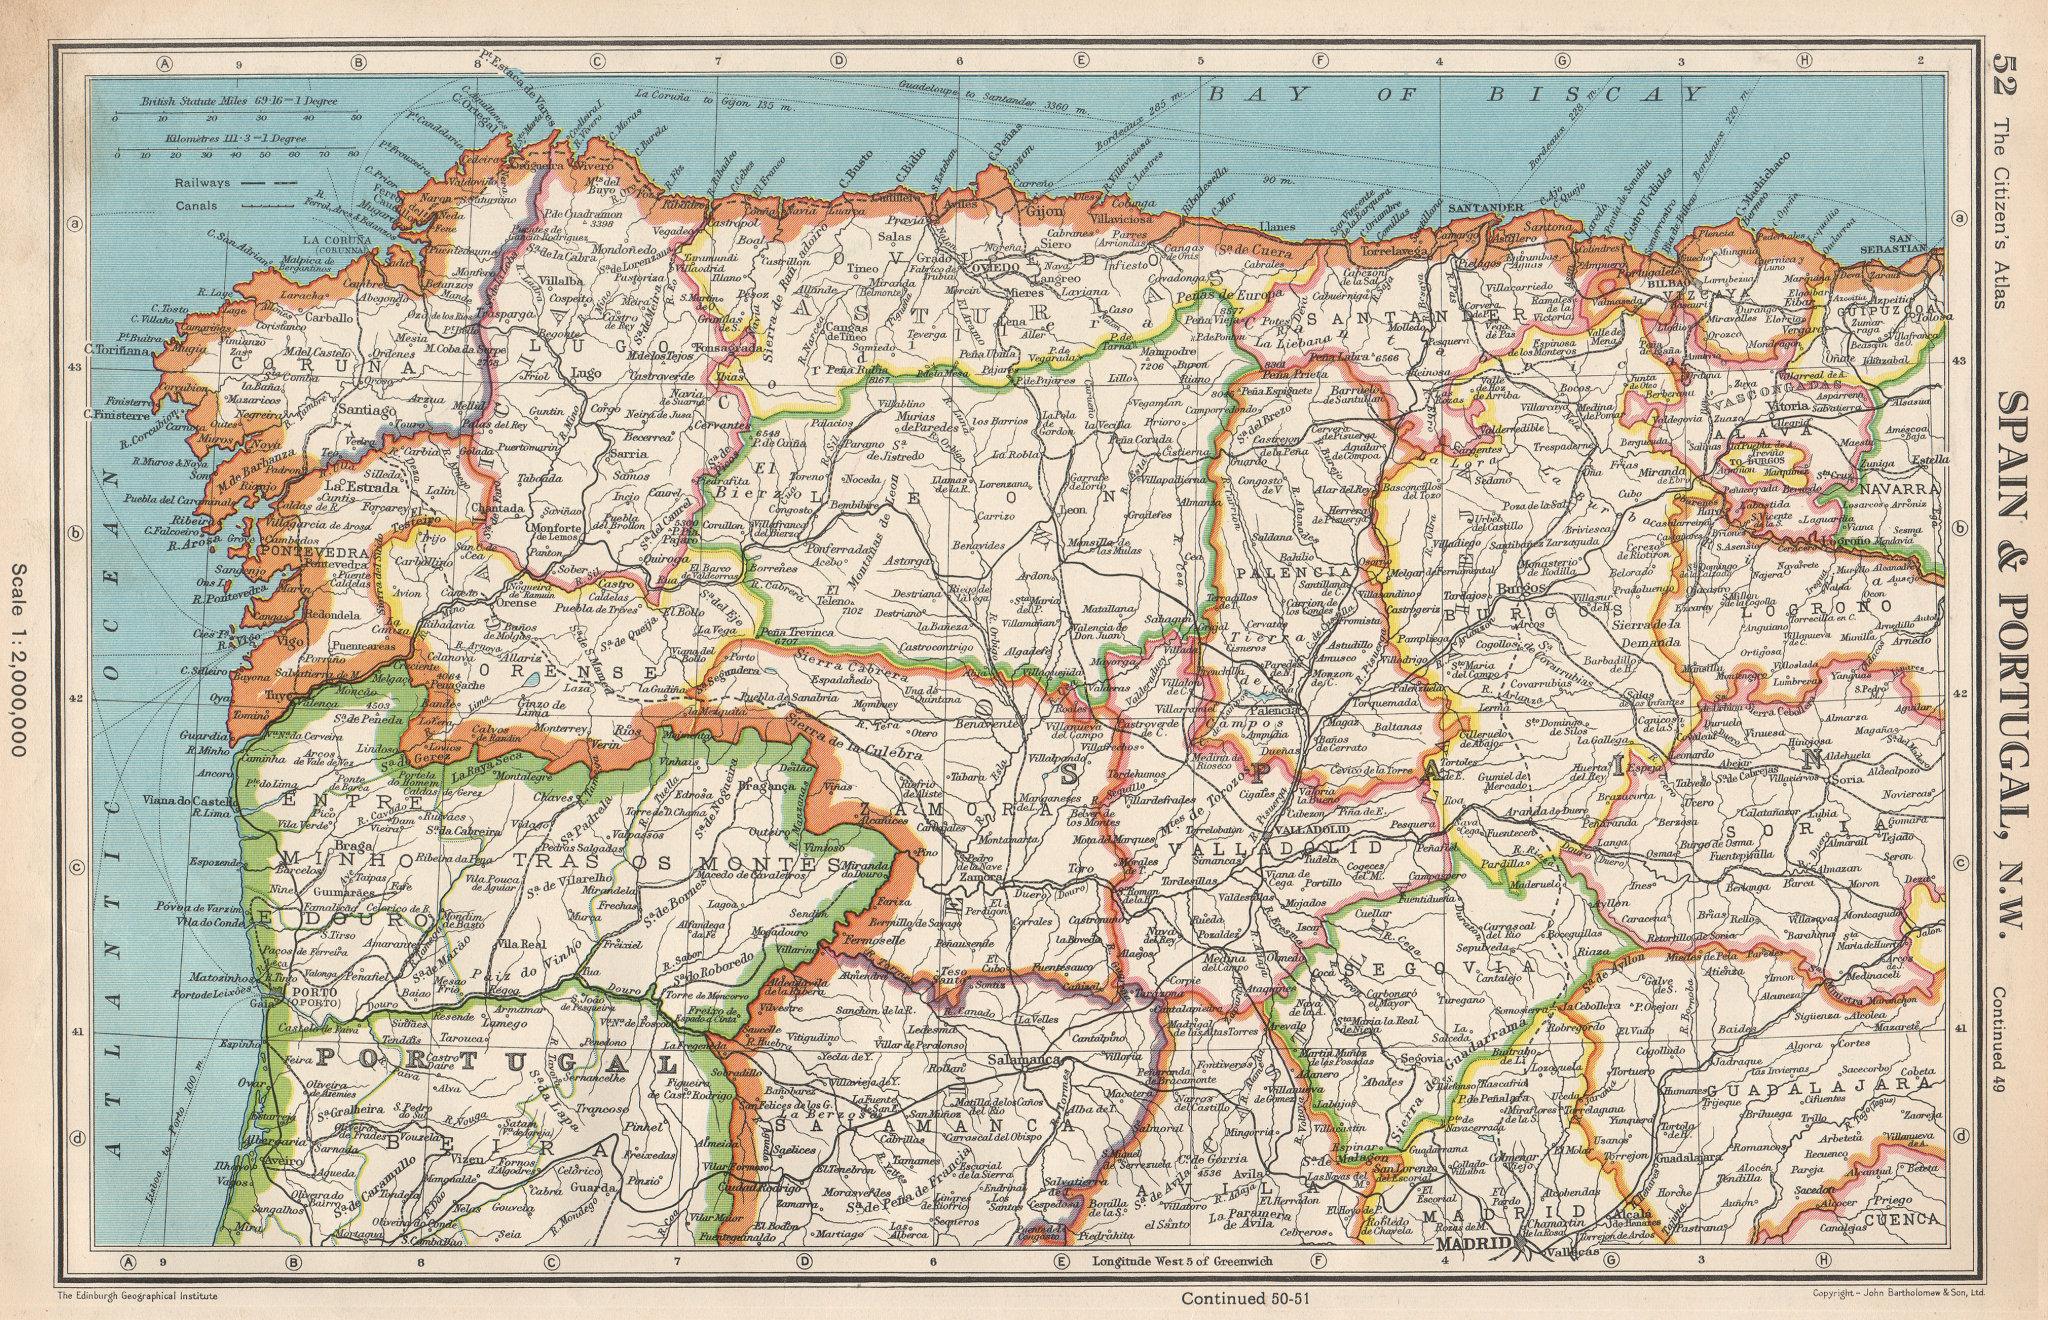 Associate Product IBERIA N WEST. Spain Portugal. Galicia Asturias Castilla/Leon Cantabria 1952 map